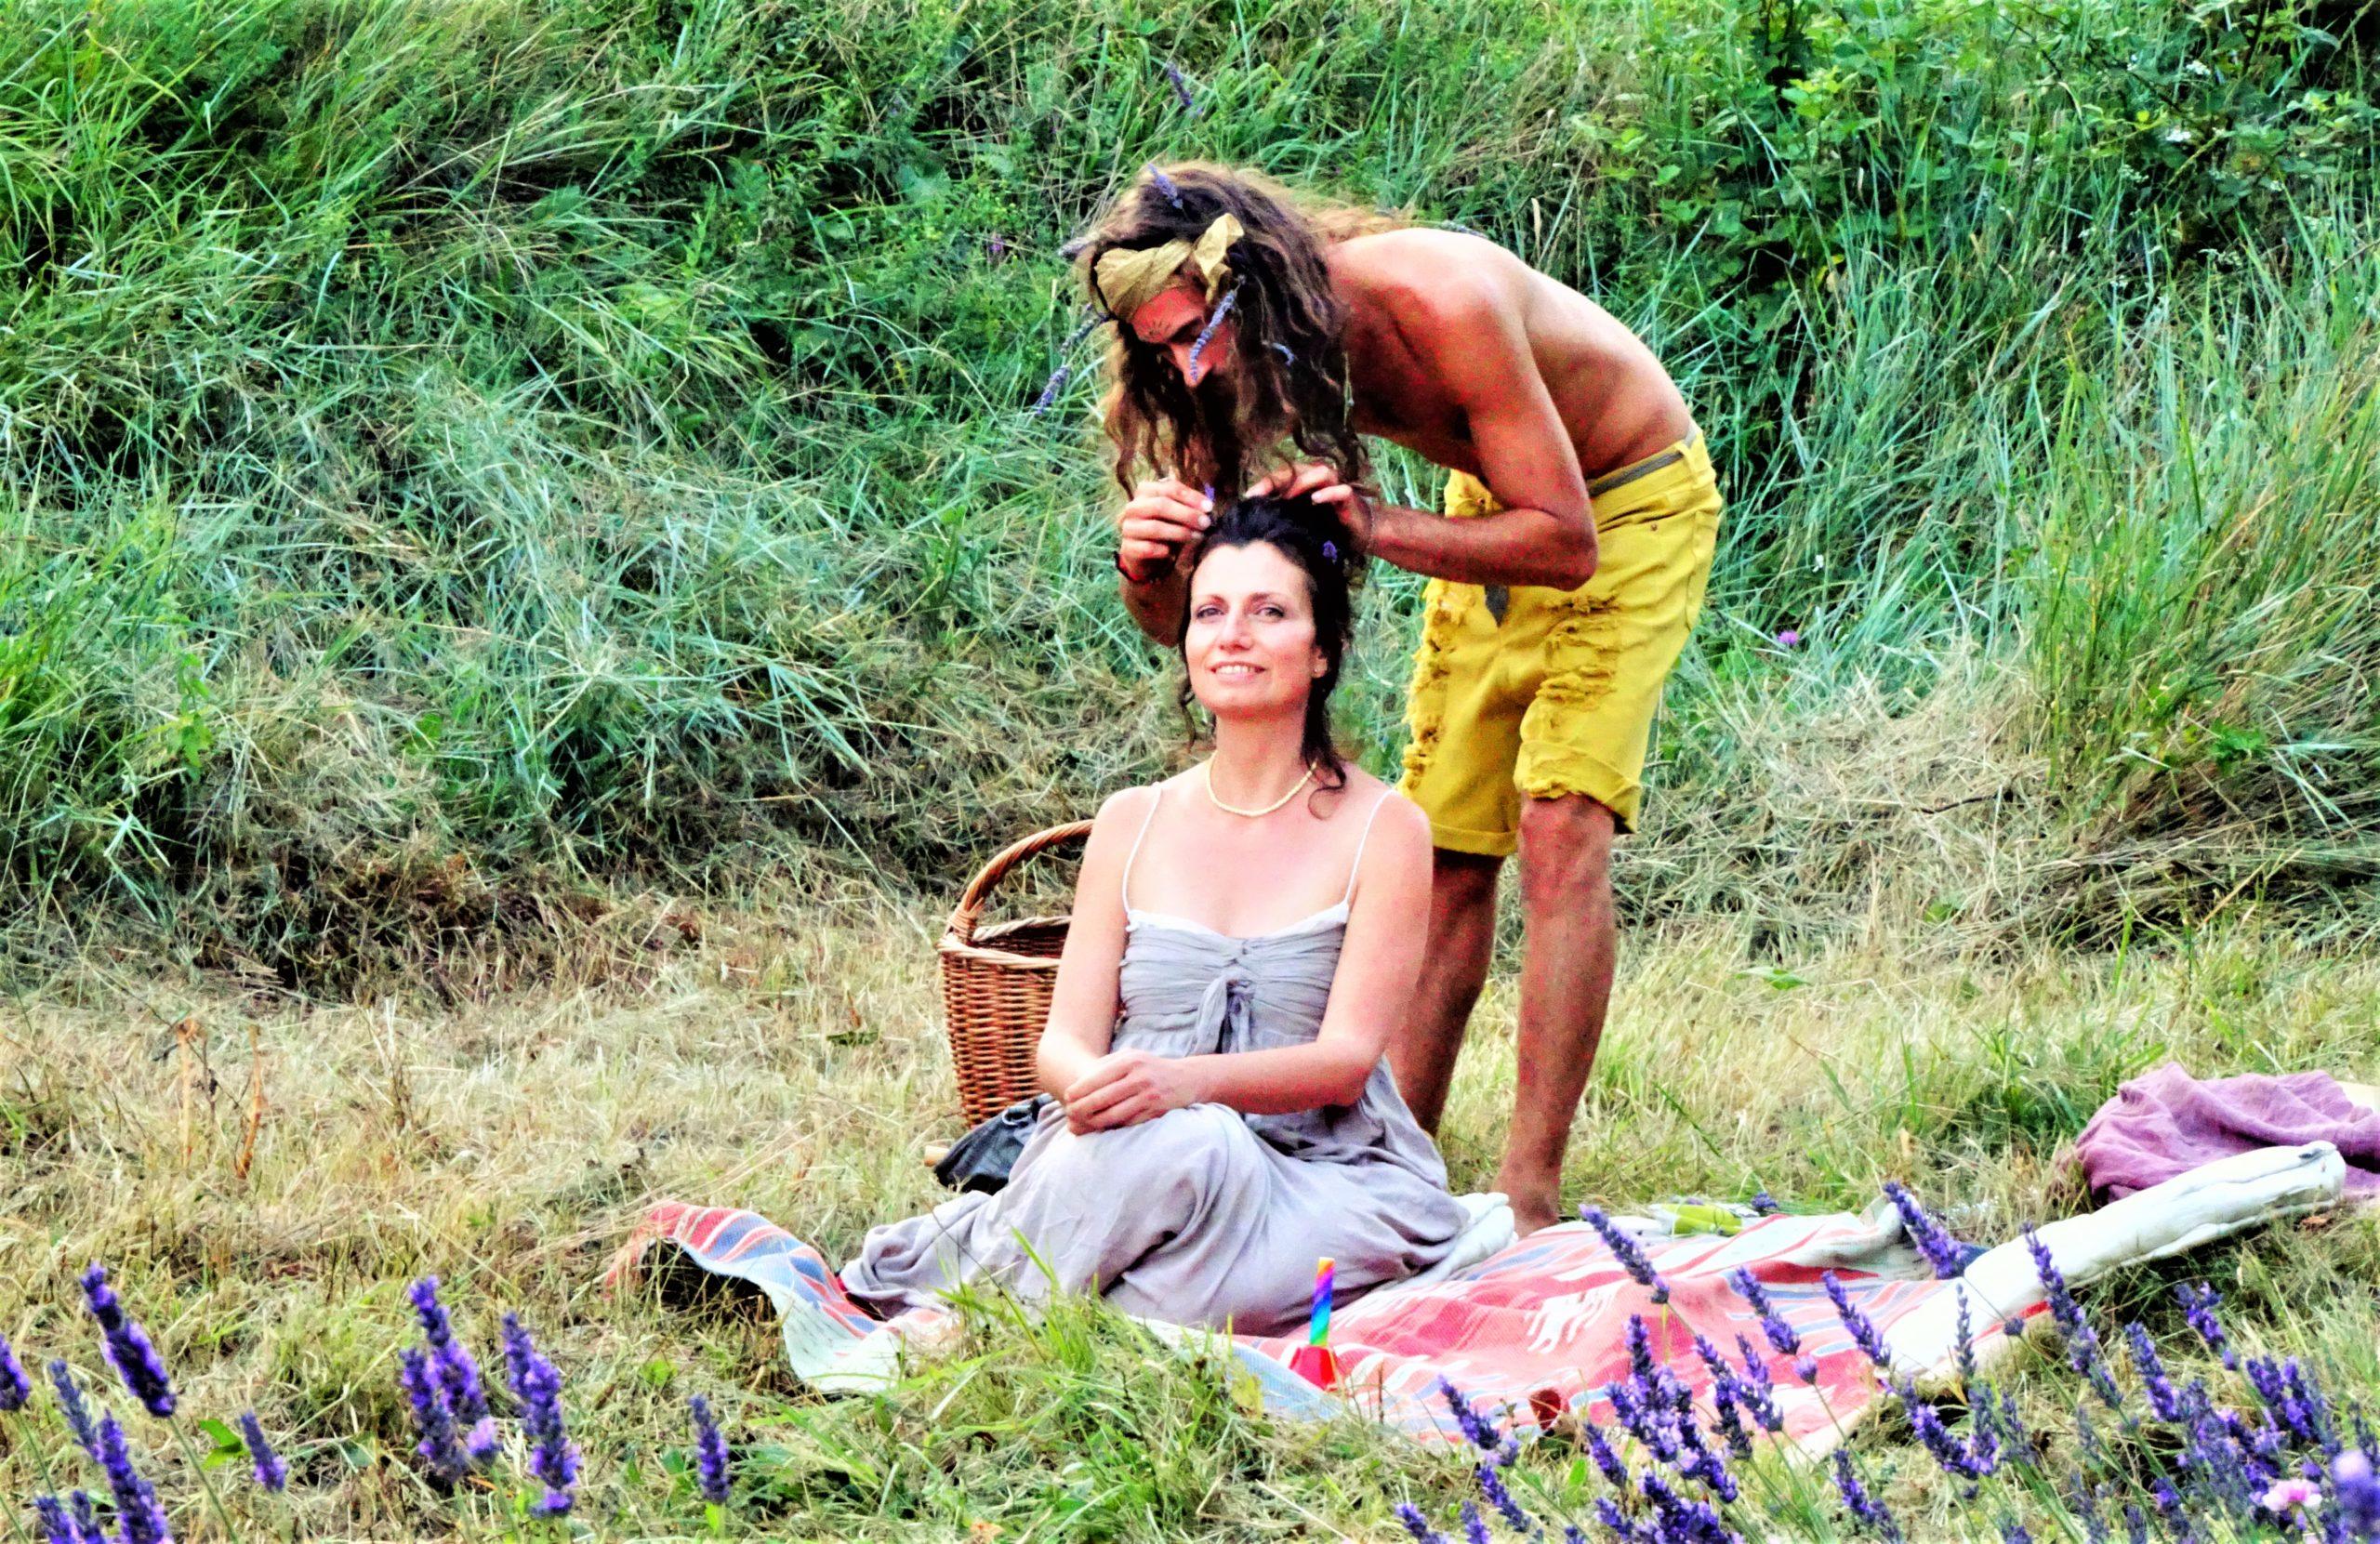 picnic lavender field italy